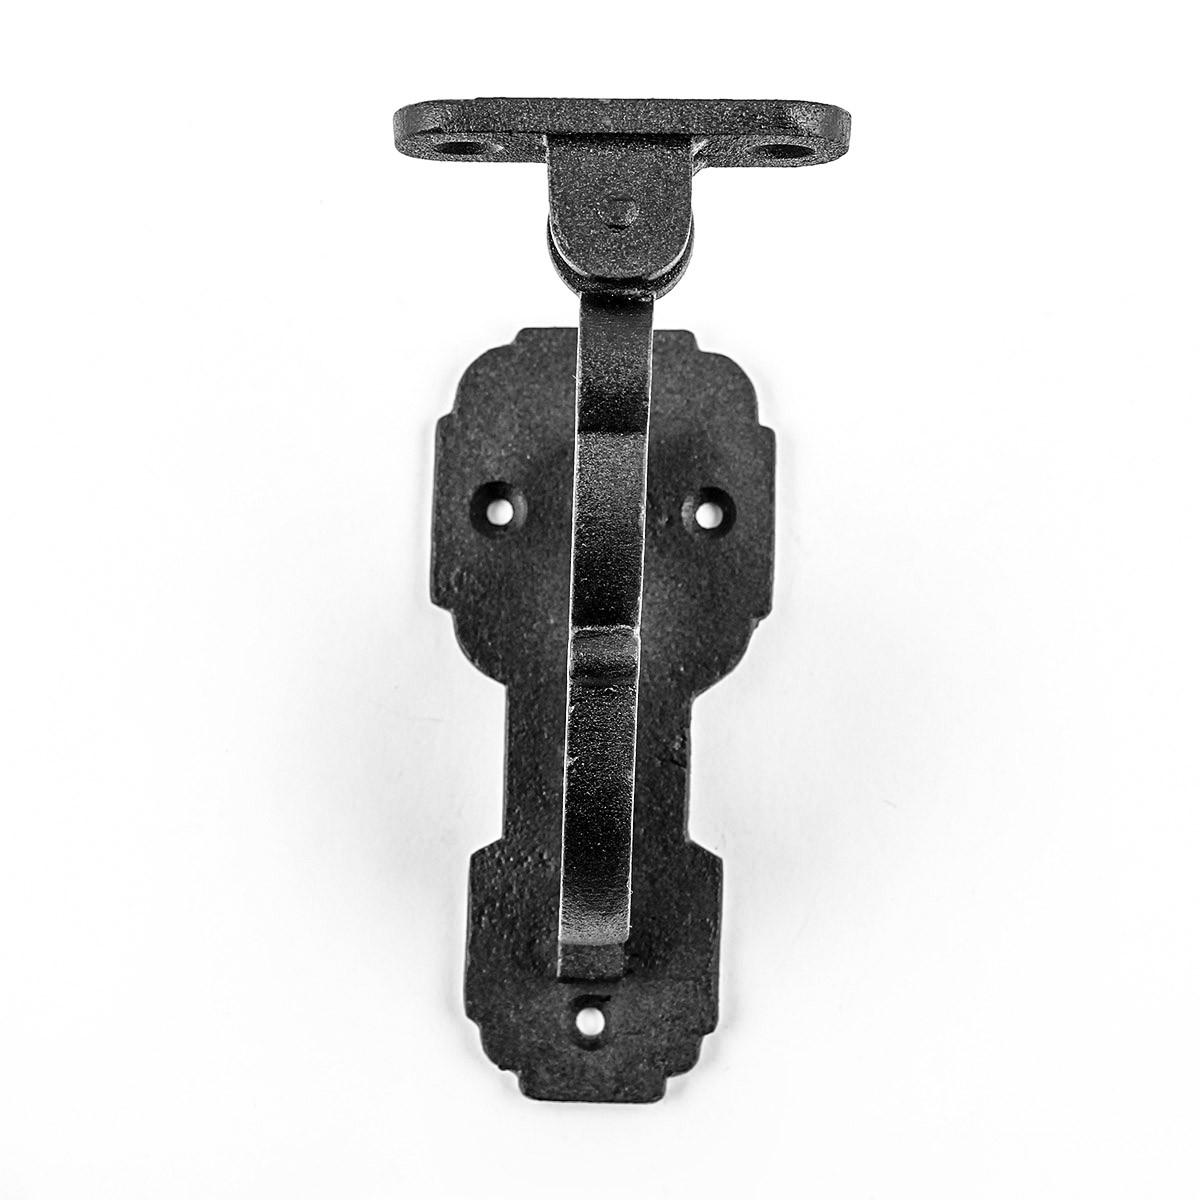 Black RSF Iron Hand Rail Bracket Rust Resistant Finish Wrought Iron Handrail Bracket Handrail Bracket Black Staircase Handrail Bracket